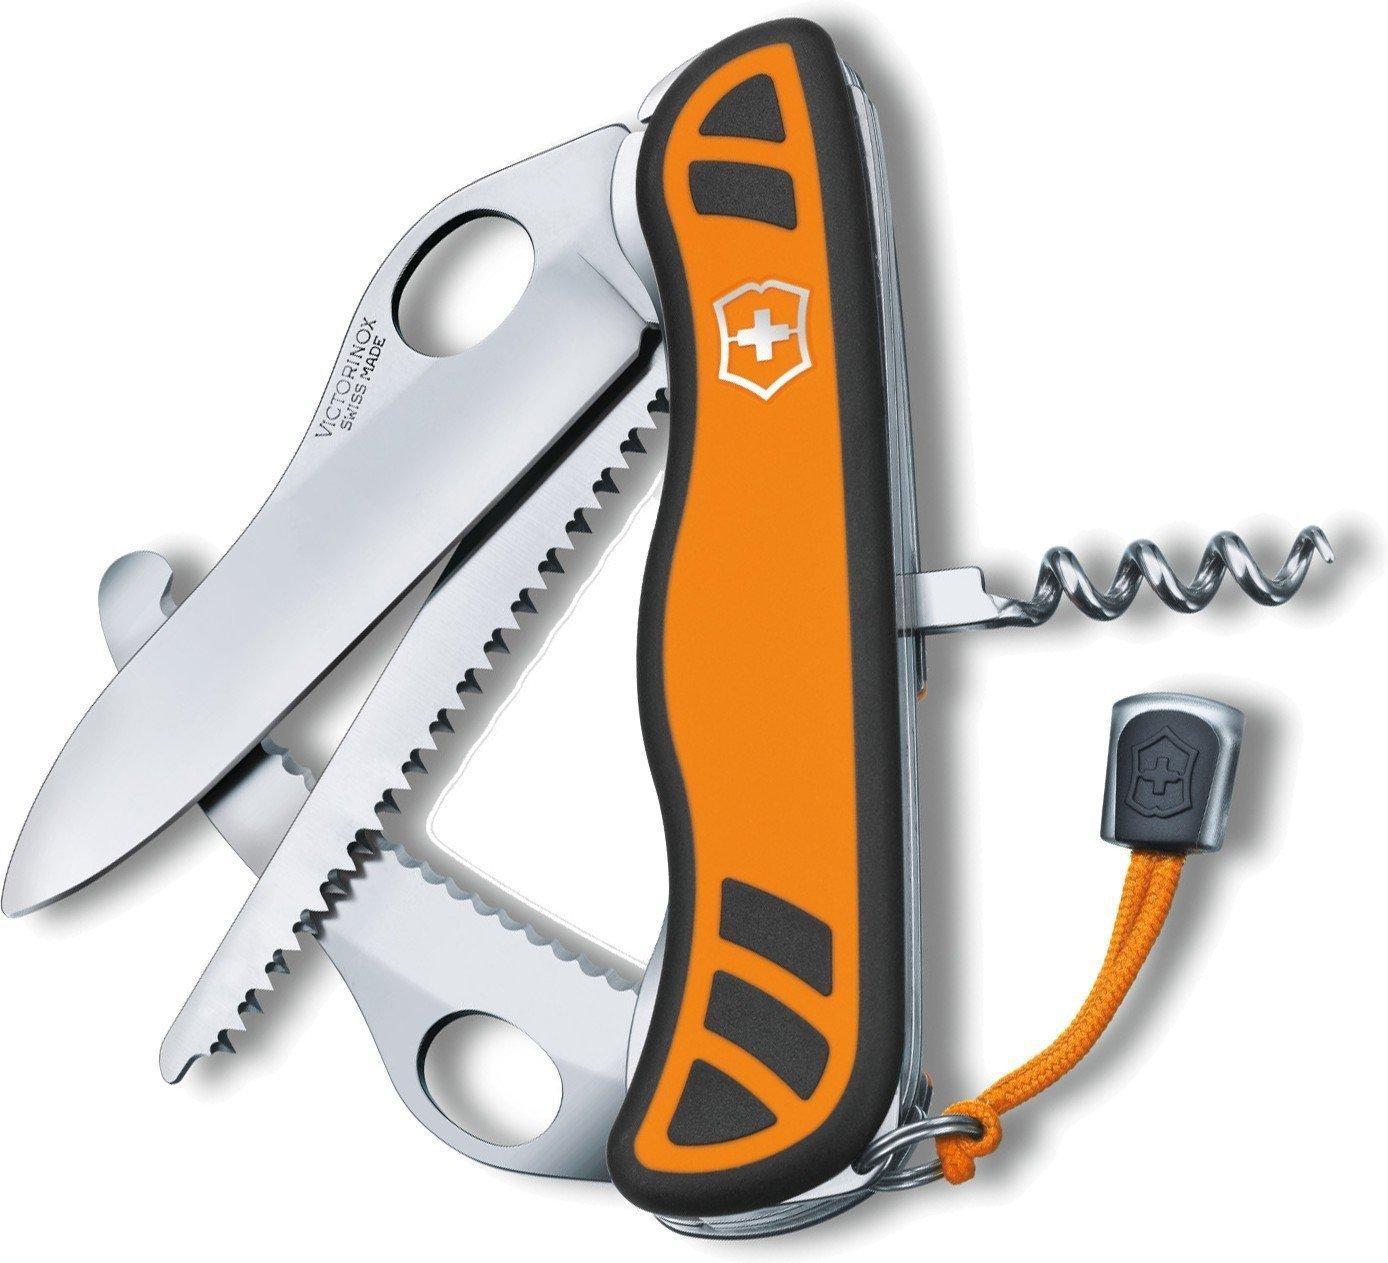 Складной швейцарский нож Victorinox Hunter XT One Hand (0.8341.MC9) - Wenger-Victorinox.Ru